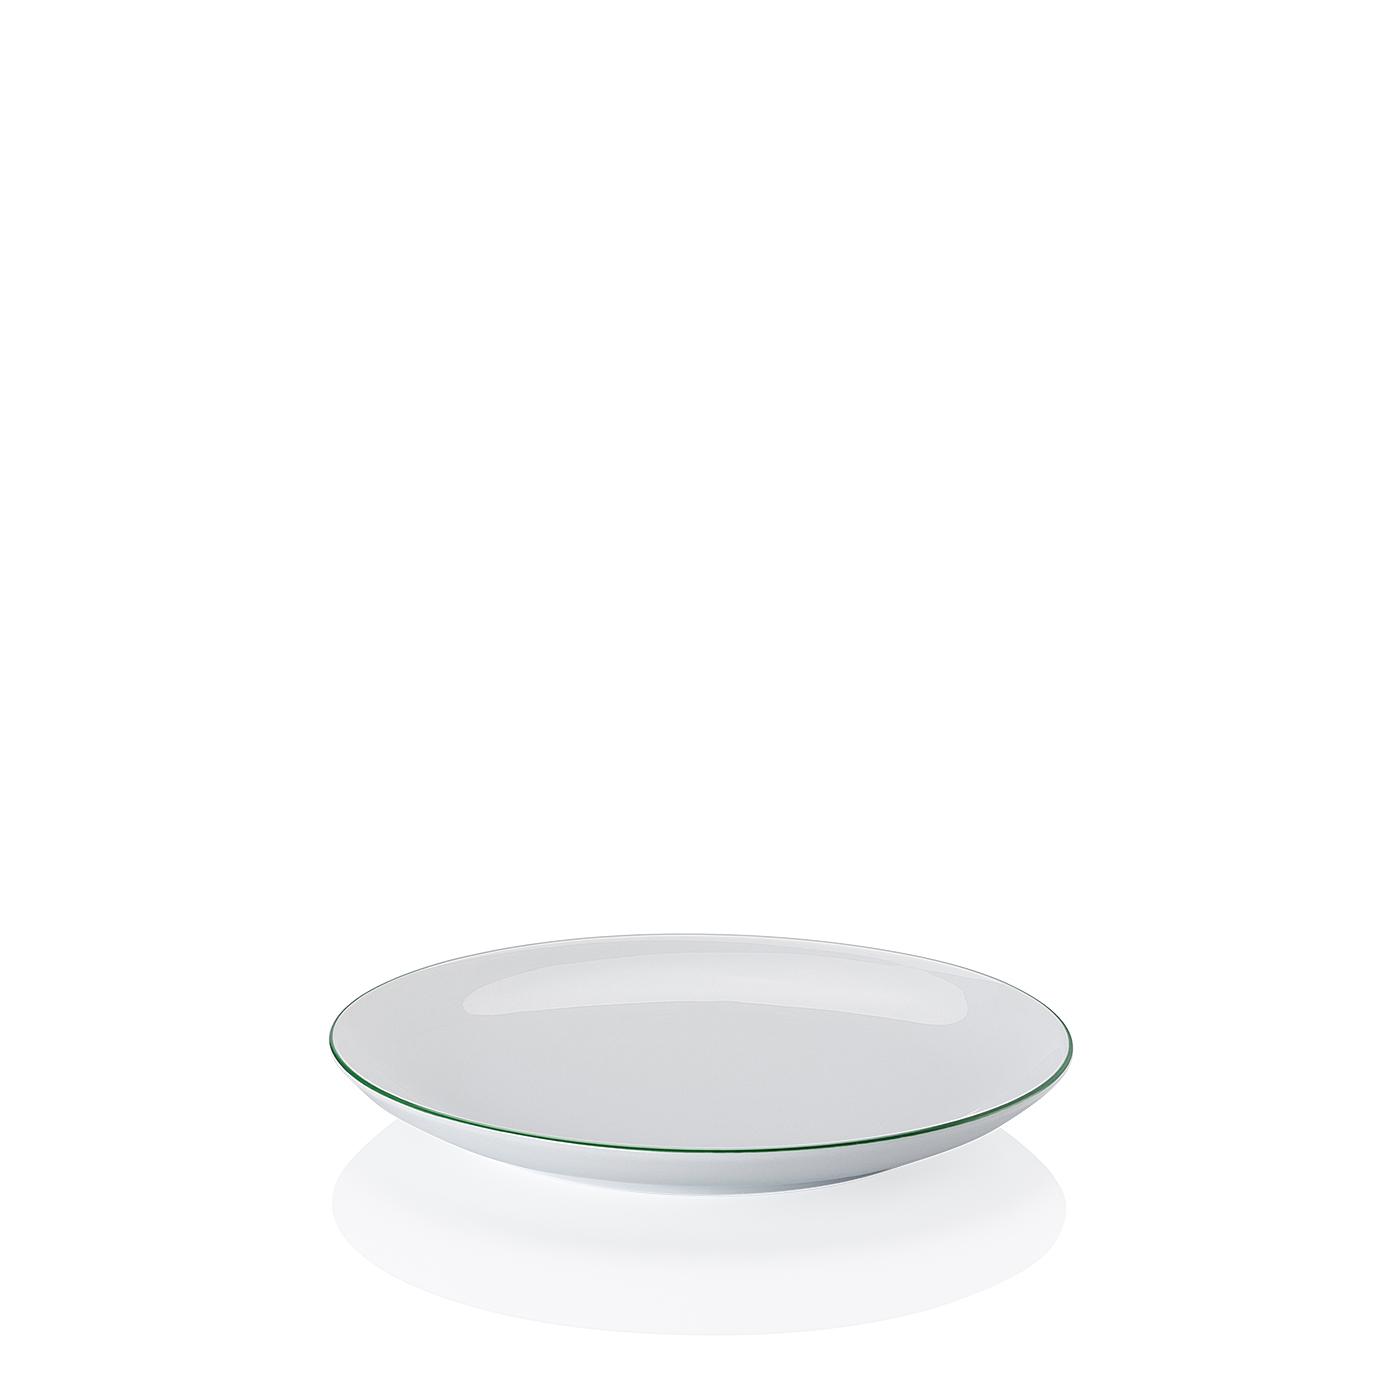 Frühstücksteller 20 cm Cucina-Basic Colori Green Arzberg